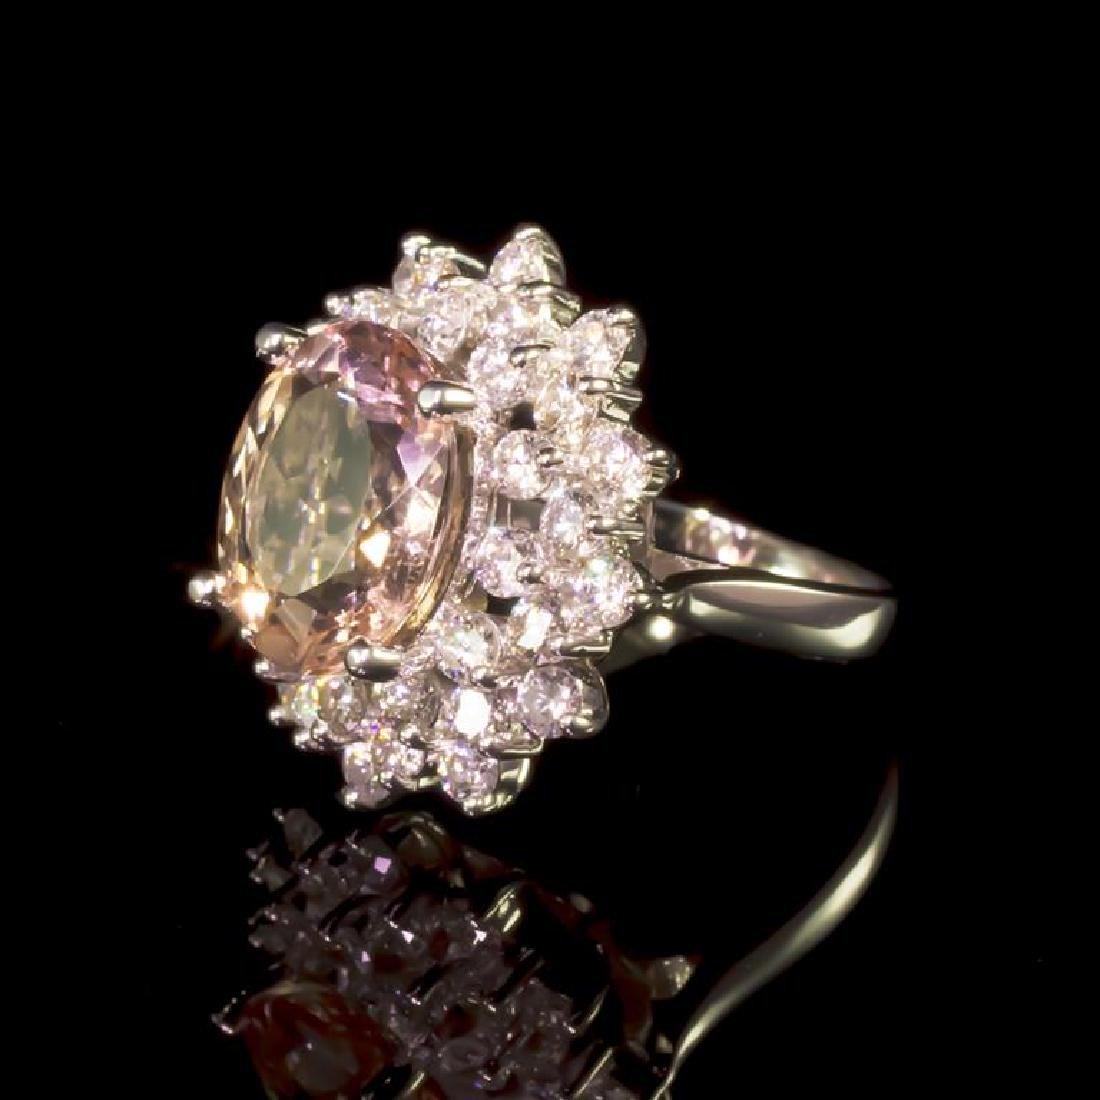 14K Gold 5.14ct Morganite 2.17ct Diamond Ring - 2